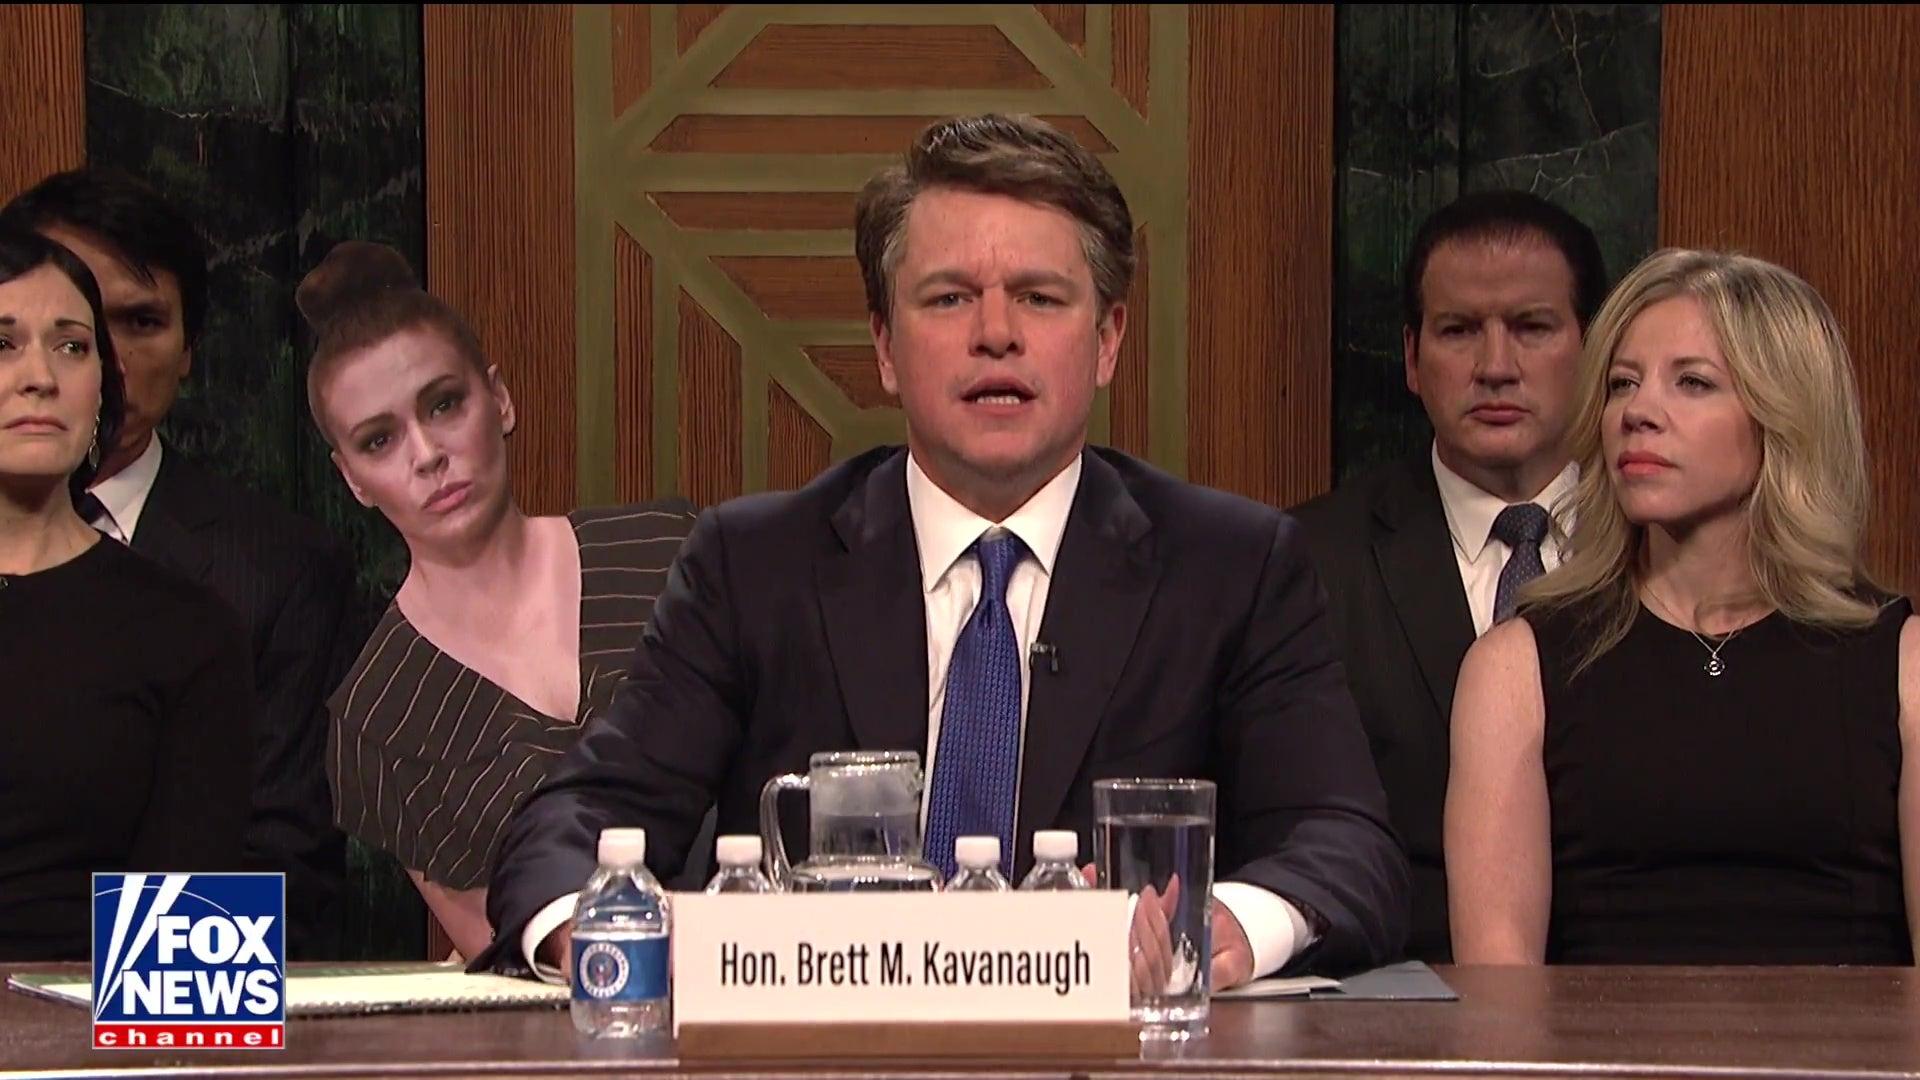 Matt Damon, as Brett Kavanaugh, sits at the hearing table weeping.